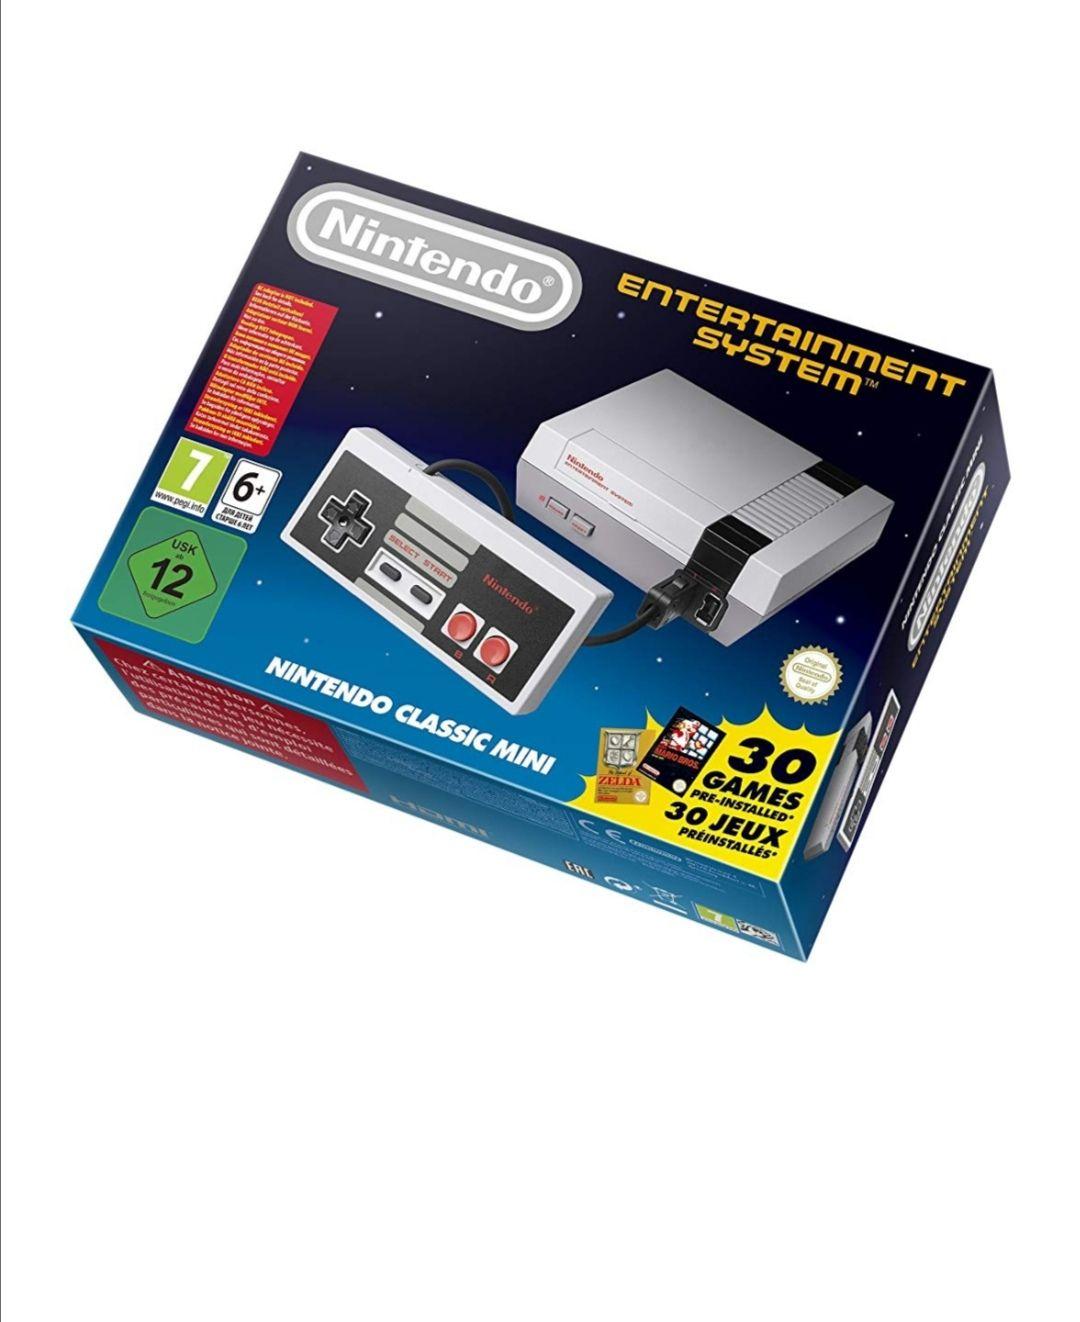 [Amazon] Nintendo Classic Mini für 49,99€